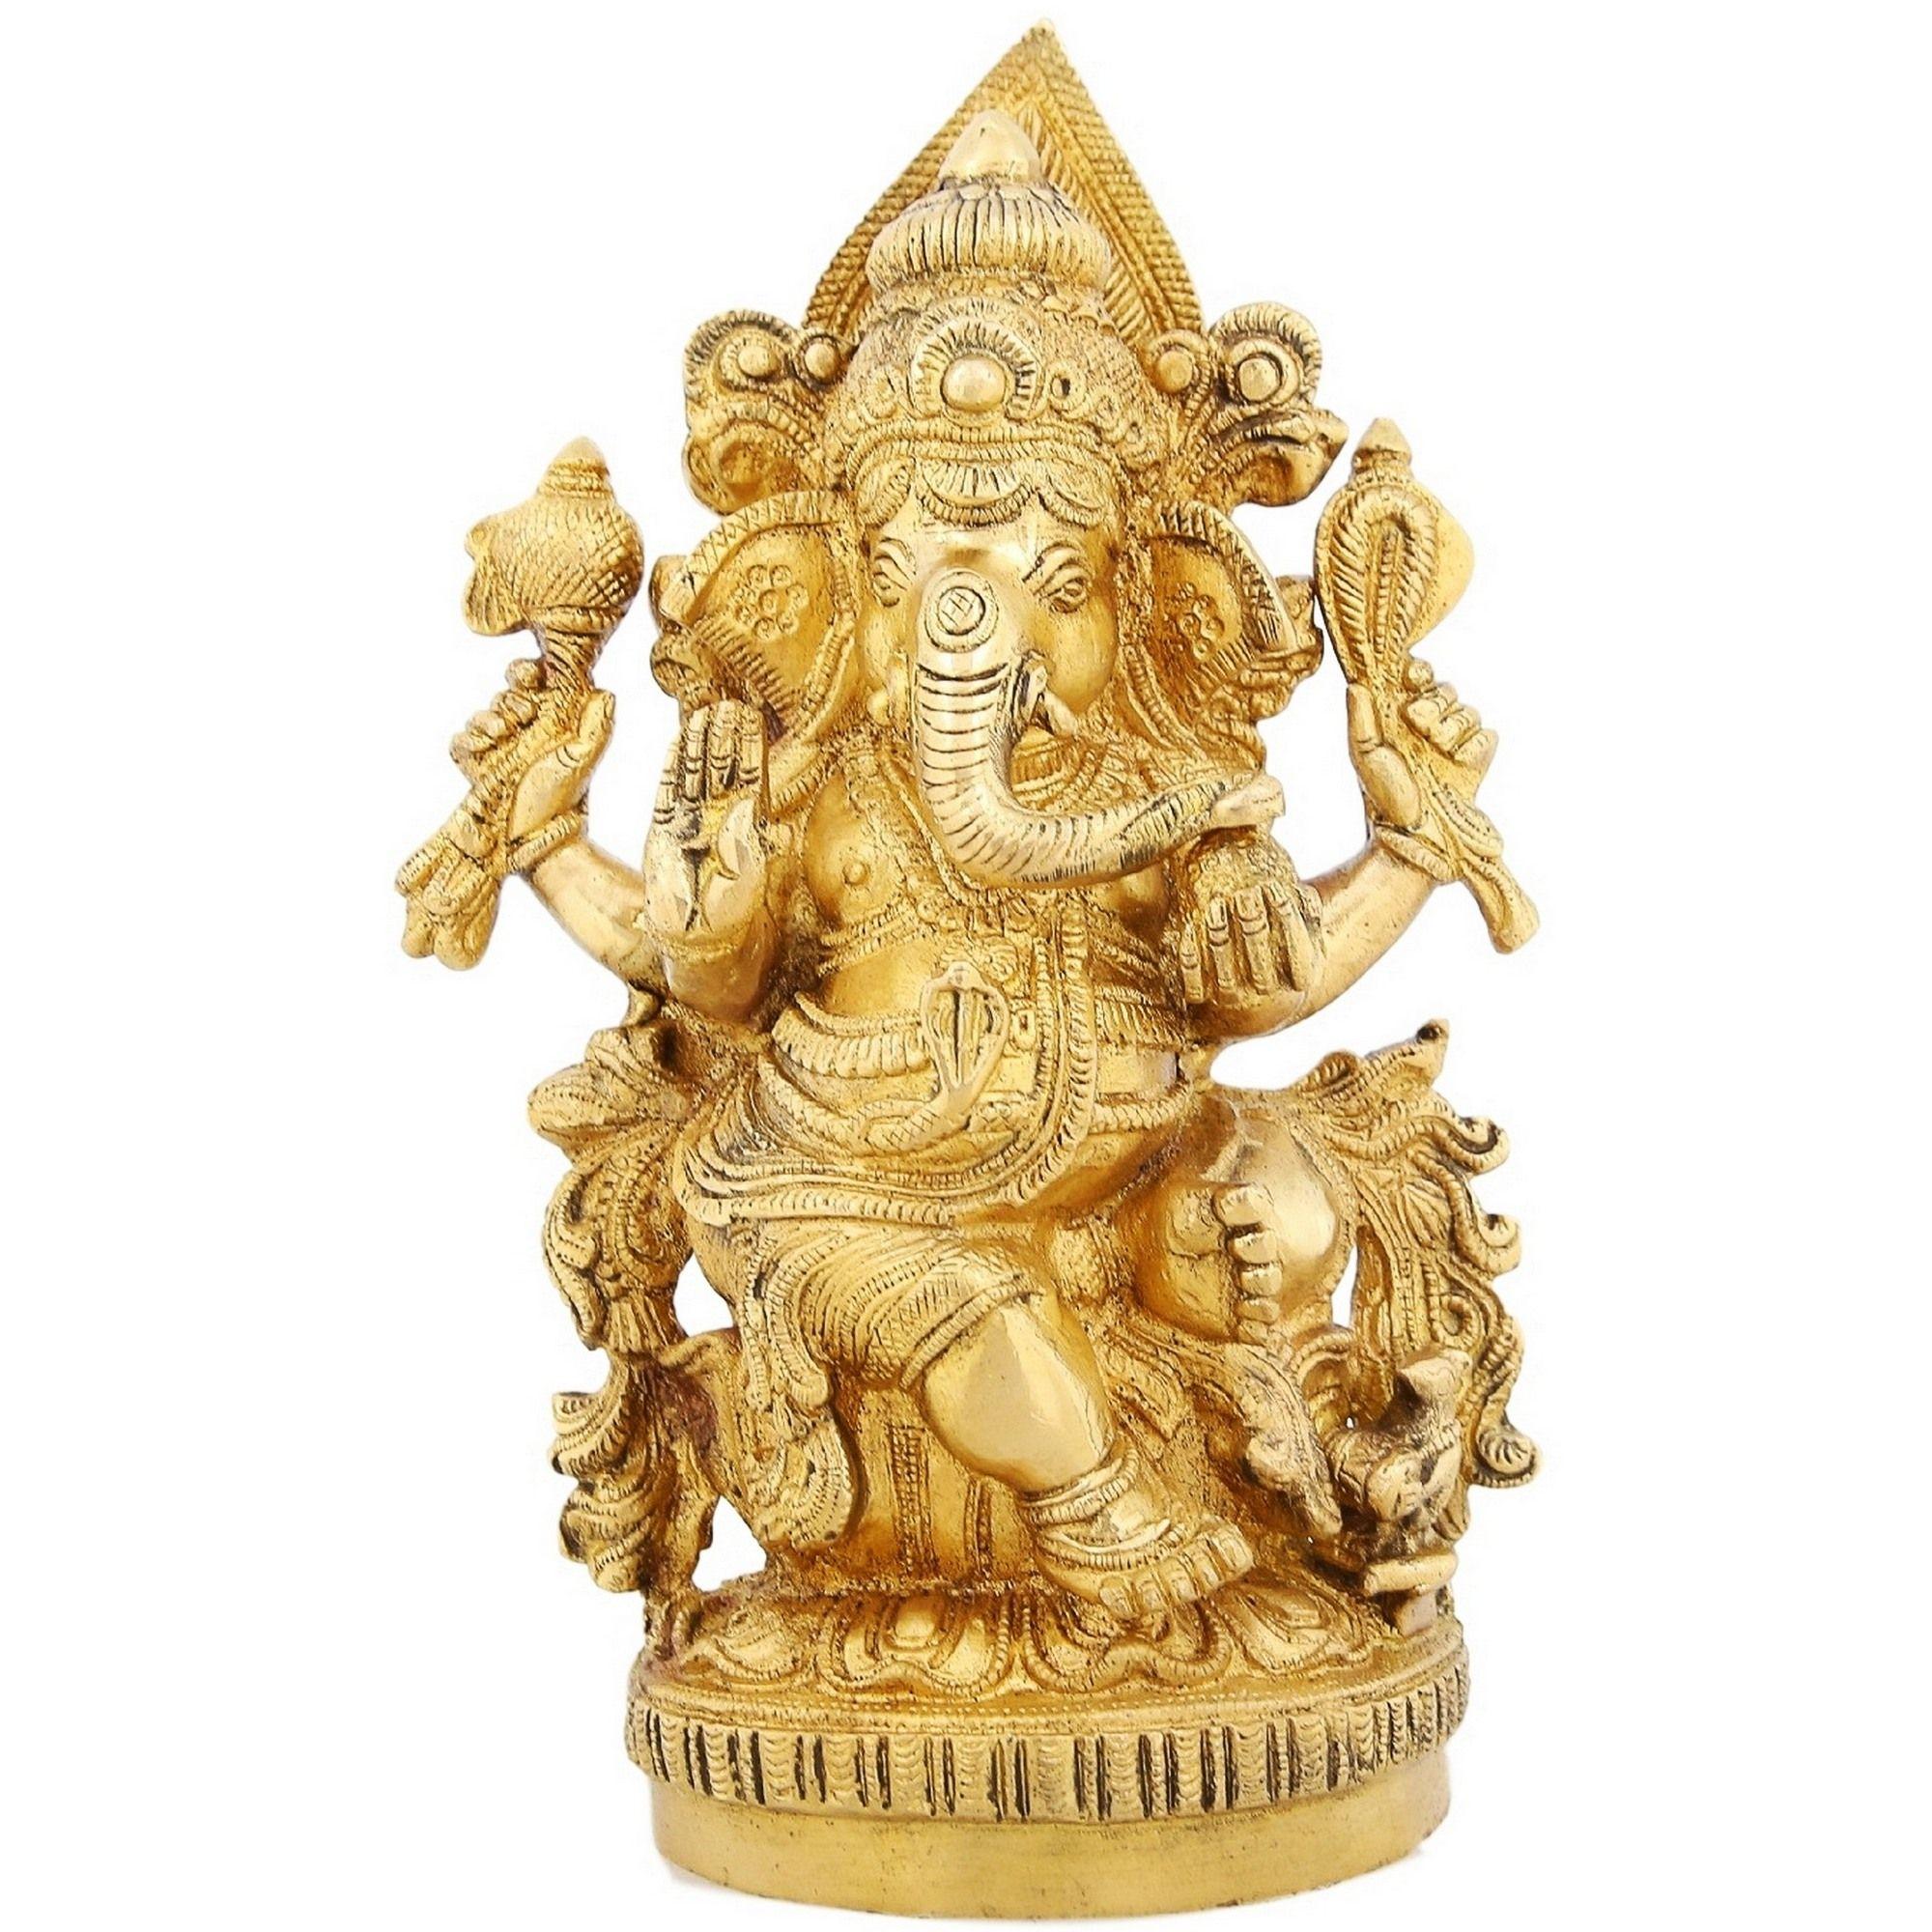 ShalinIndia Brass Figurines Of Lord Ganesha Sitting For Puja. Ganesh ...